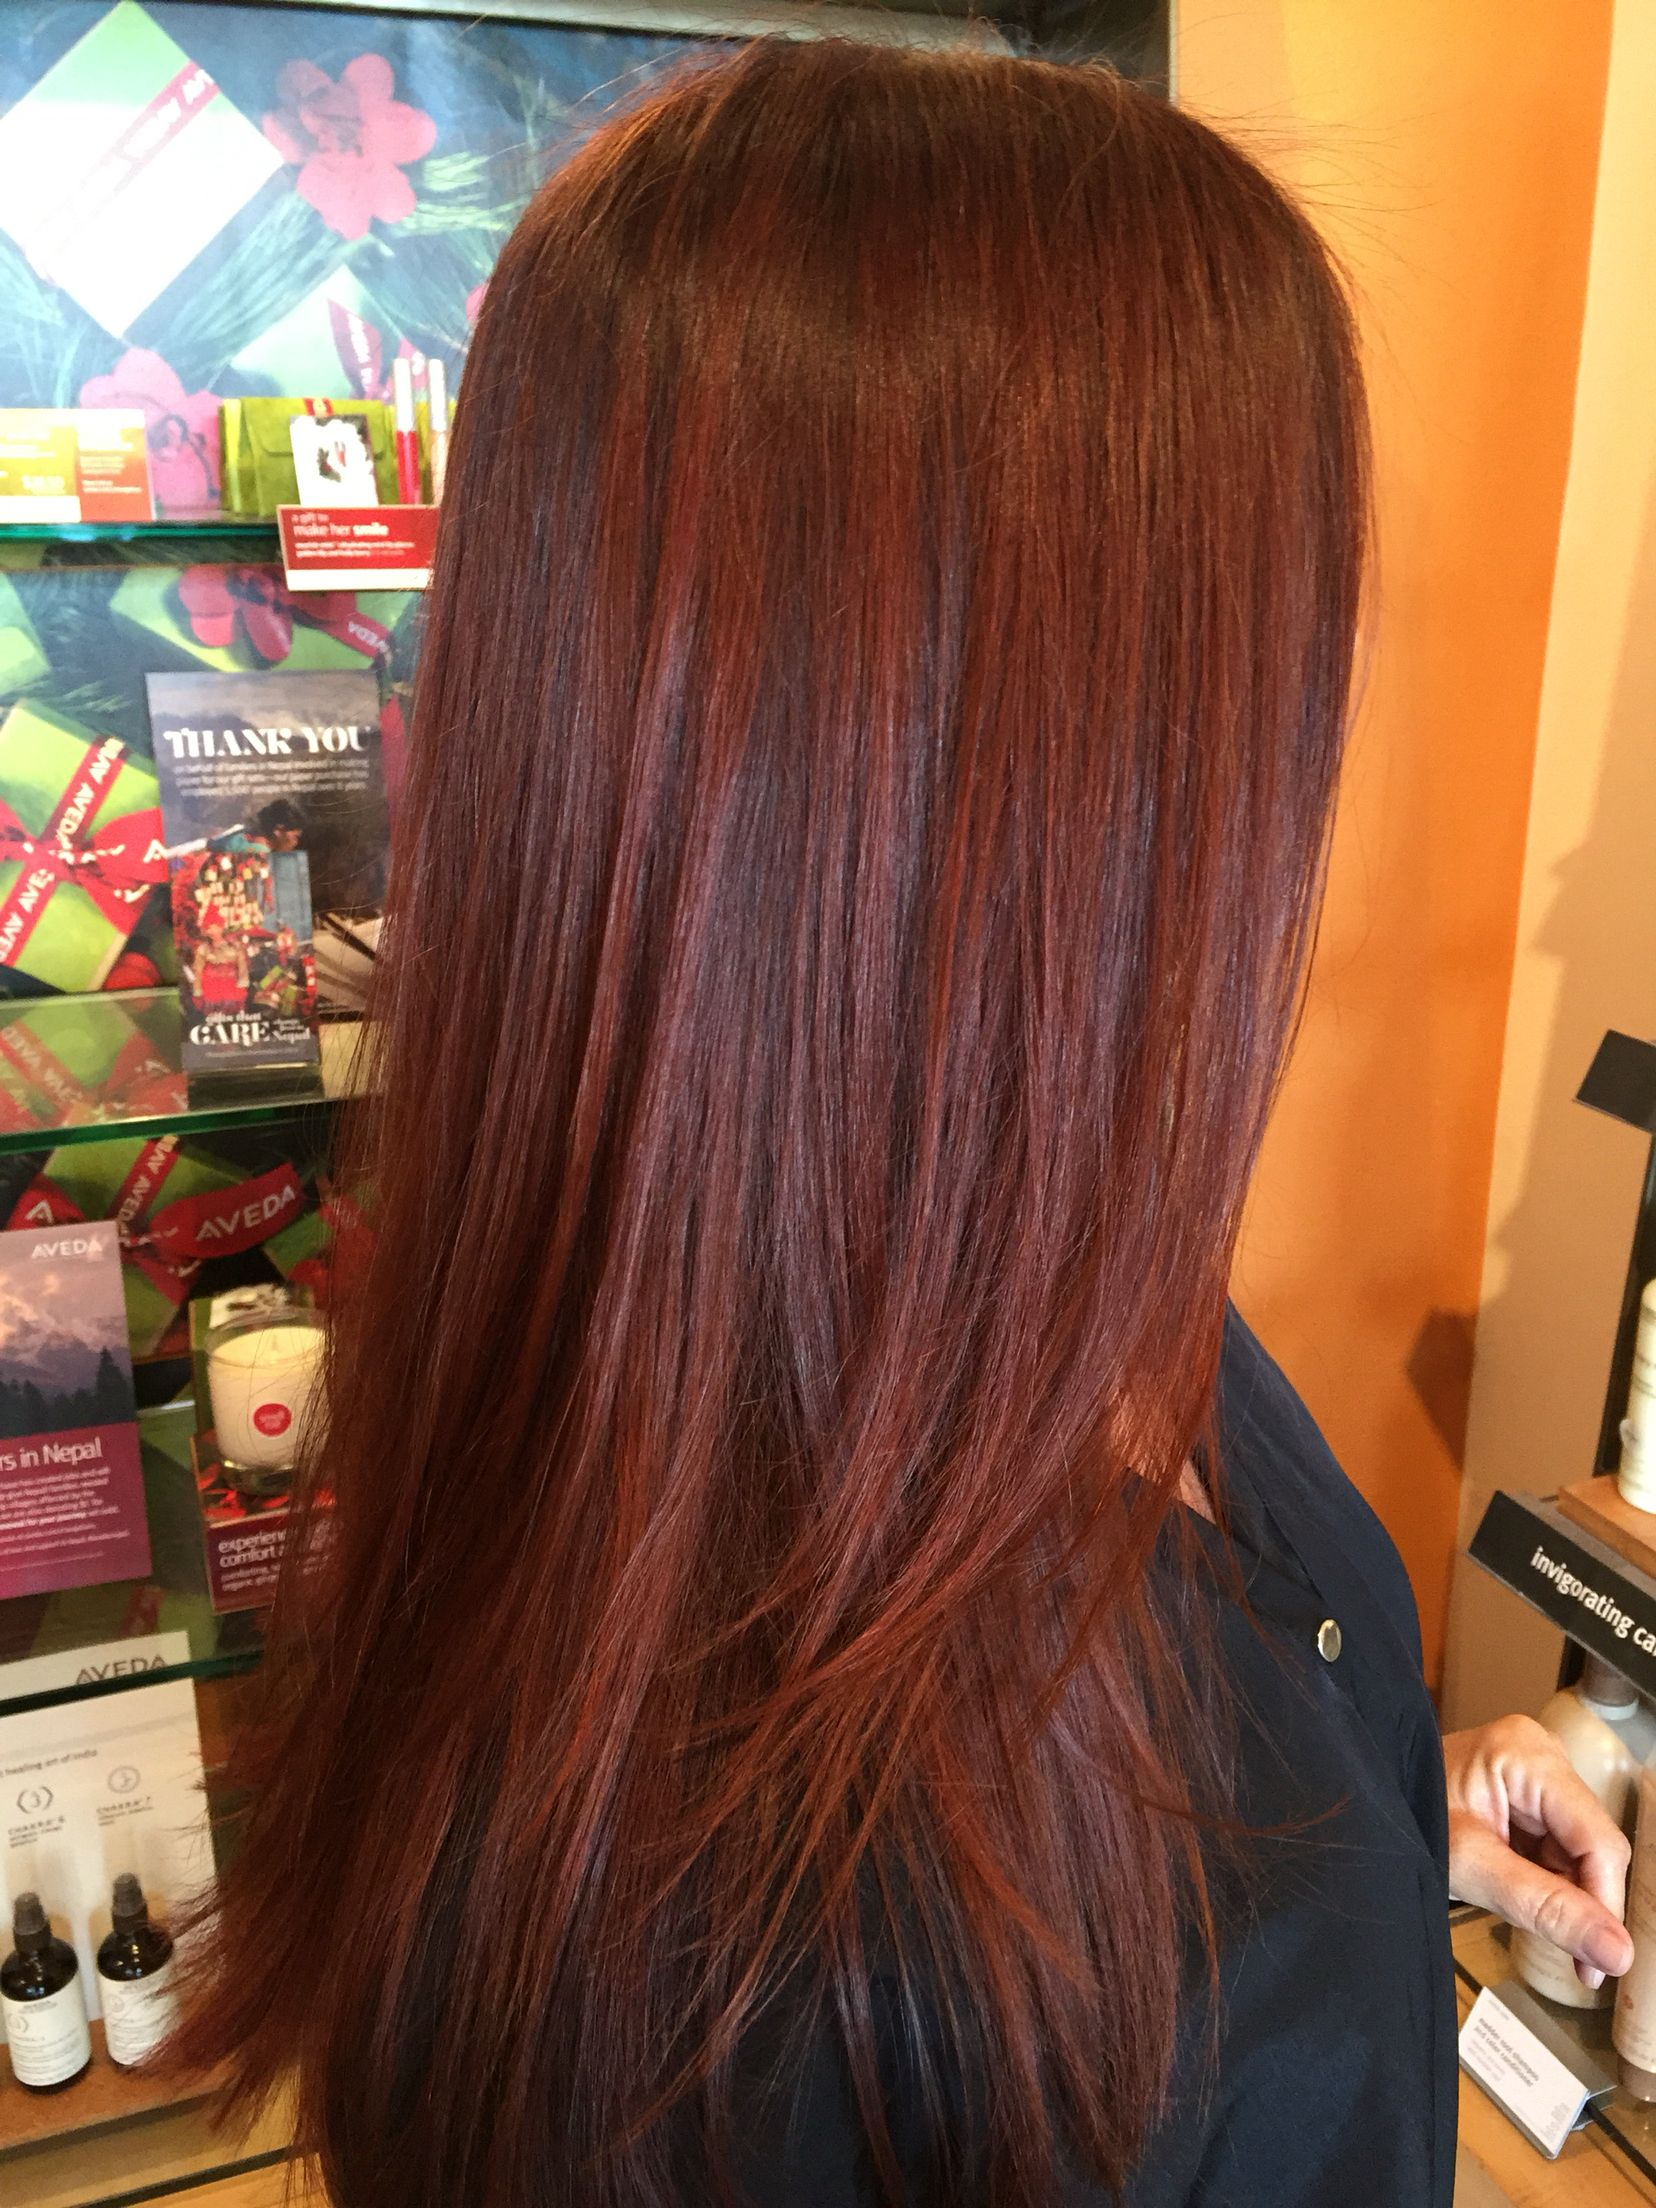 Deep Red Hair Aveda Color Aveda Hair Color Hair Color Auburn Deep Red Hair